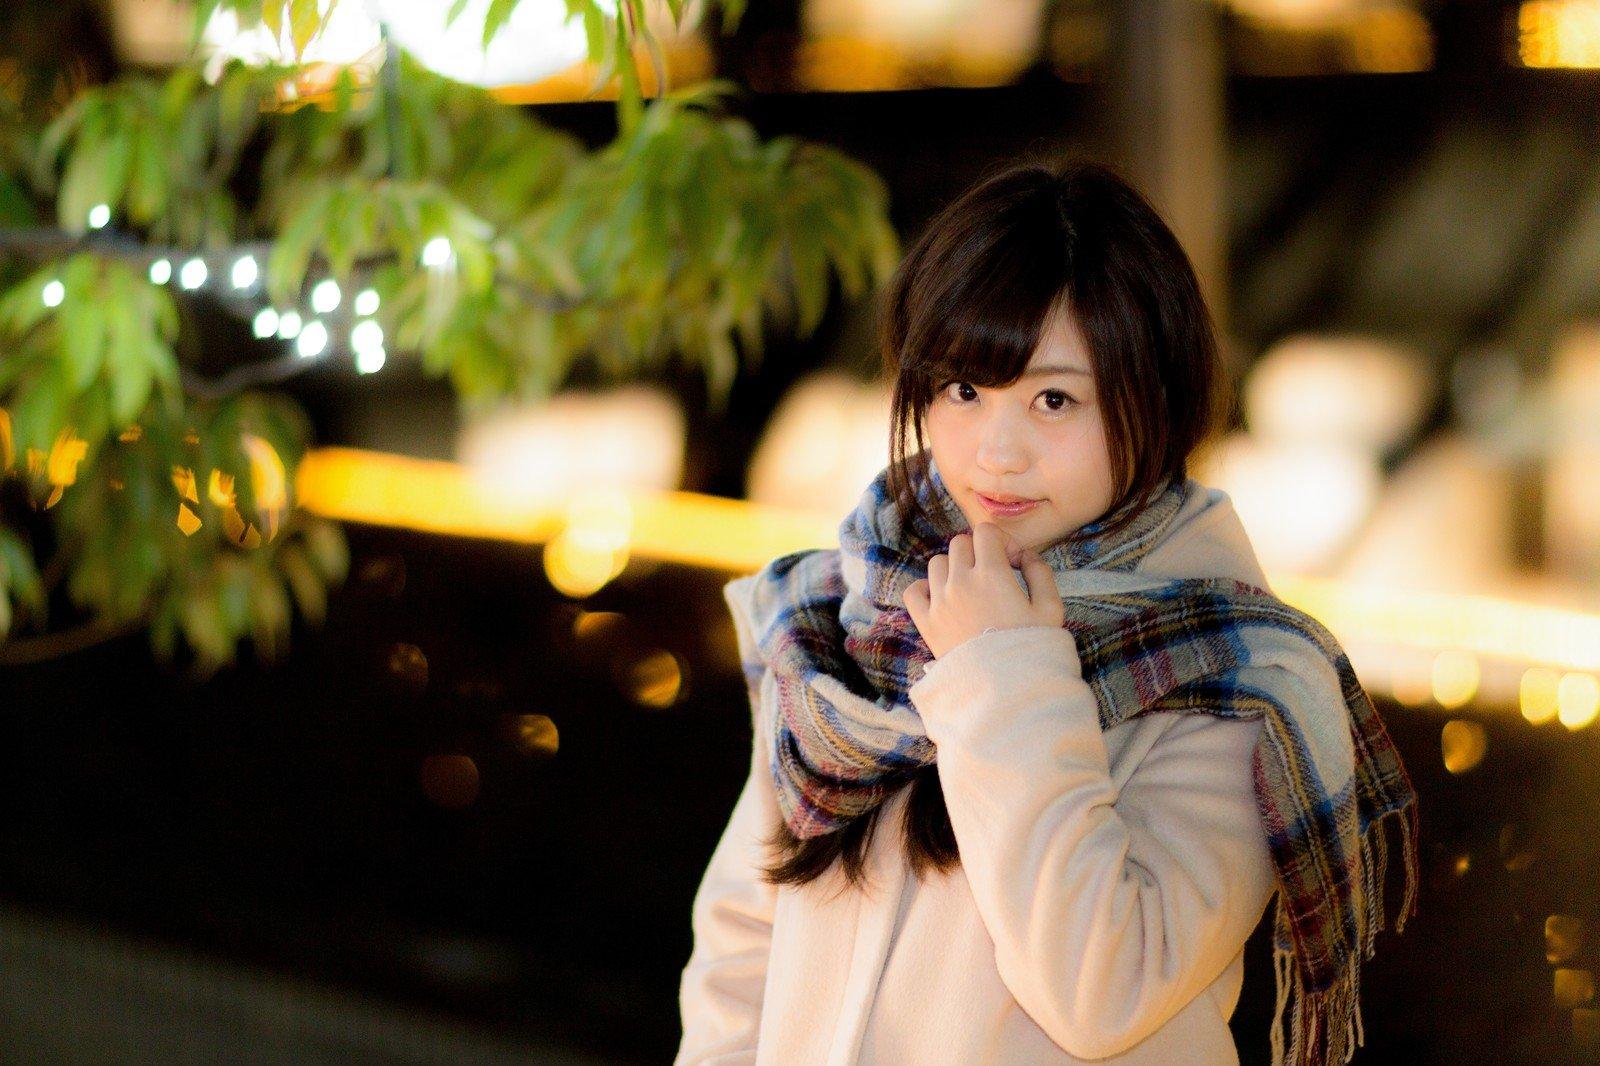 yuka16011215img 5574 tp v.jpg?resize=1200,630 - 風俗にスカウトされやすい女性の特徴って?声かけのポイントに迫る!